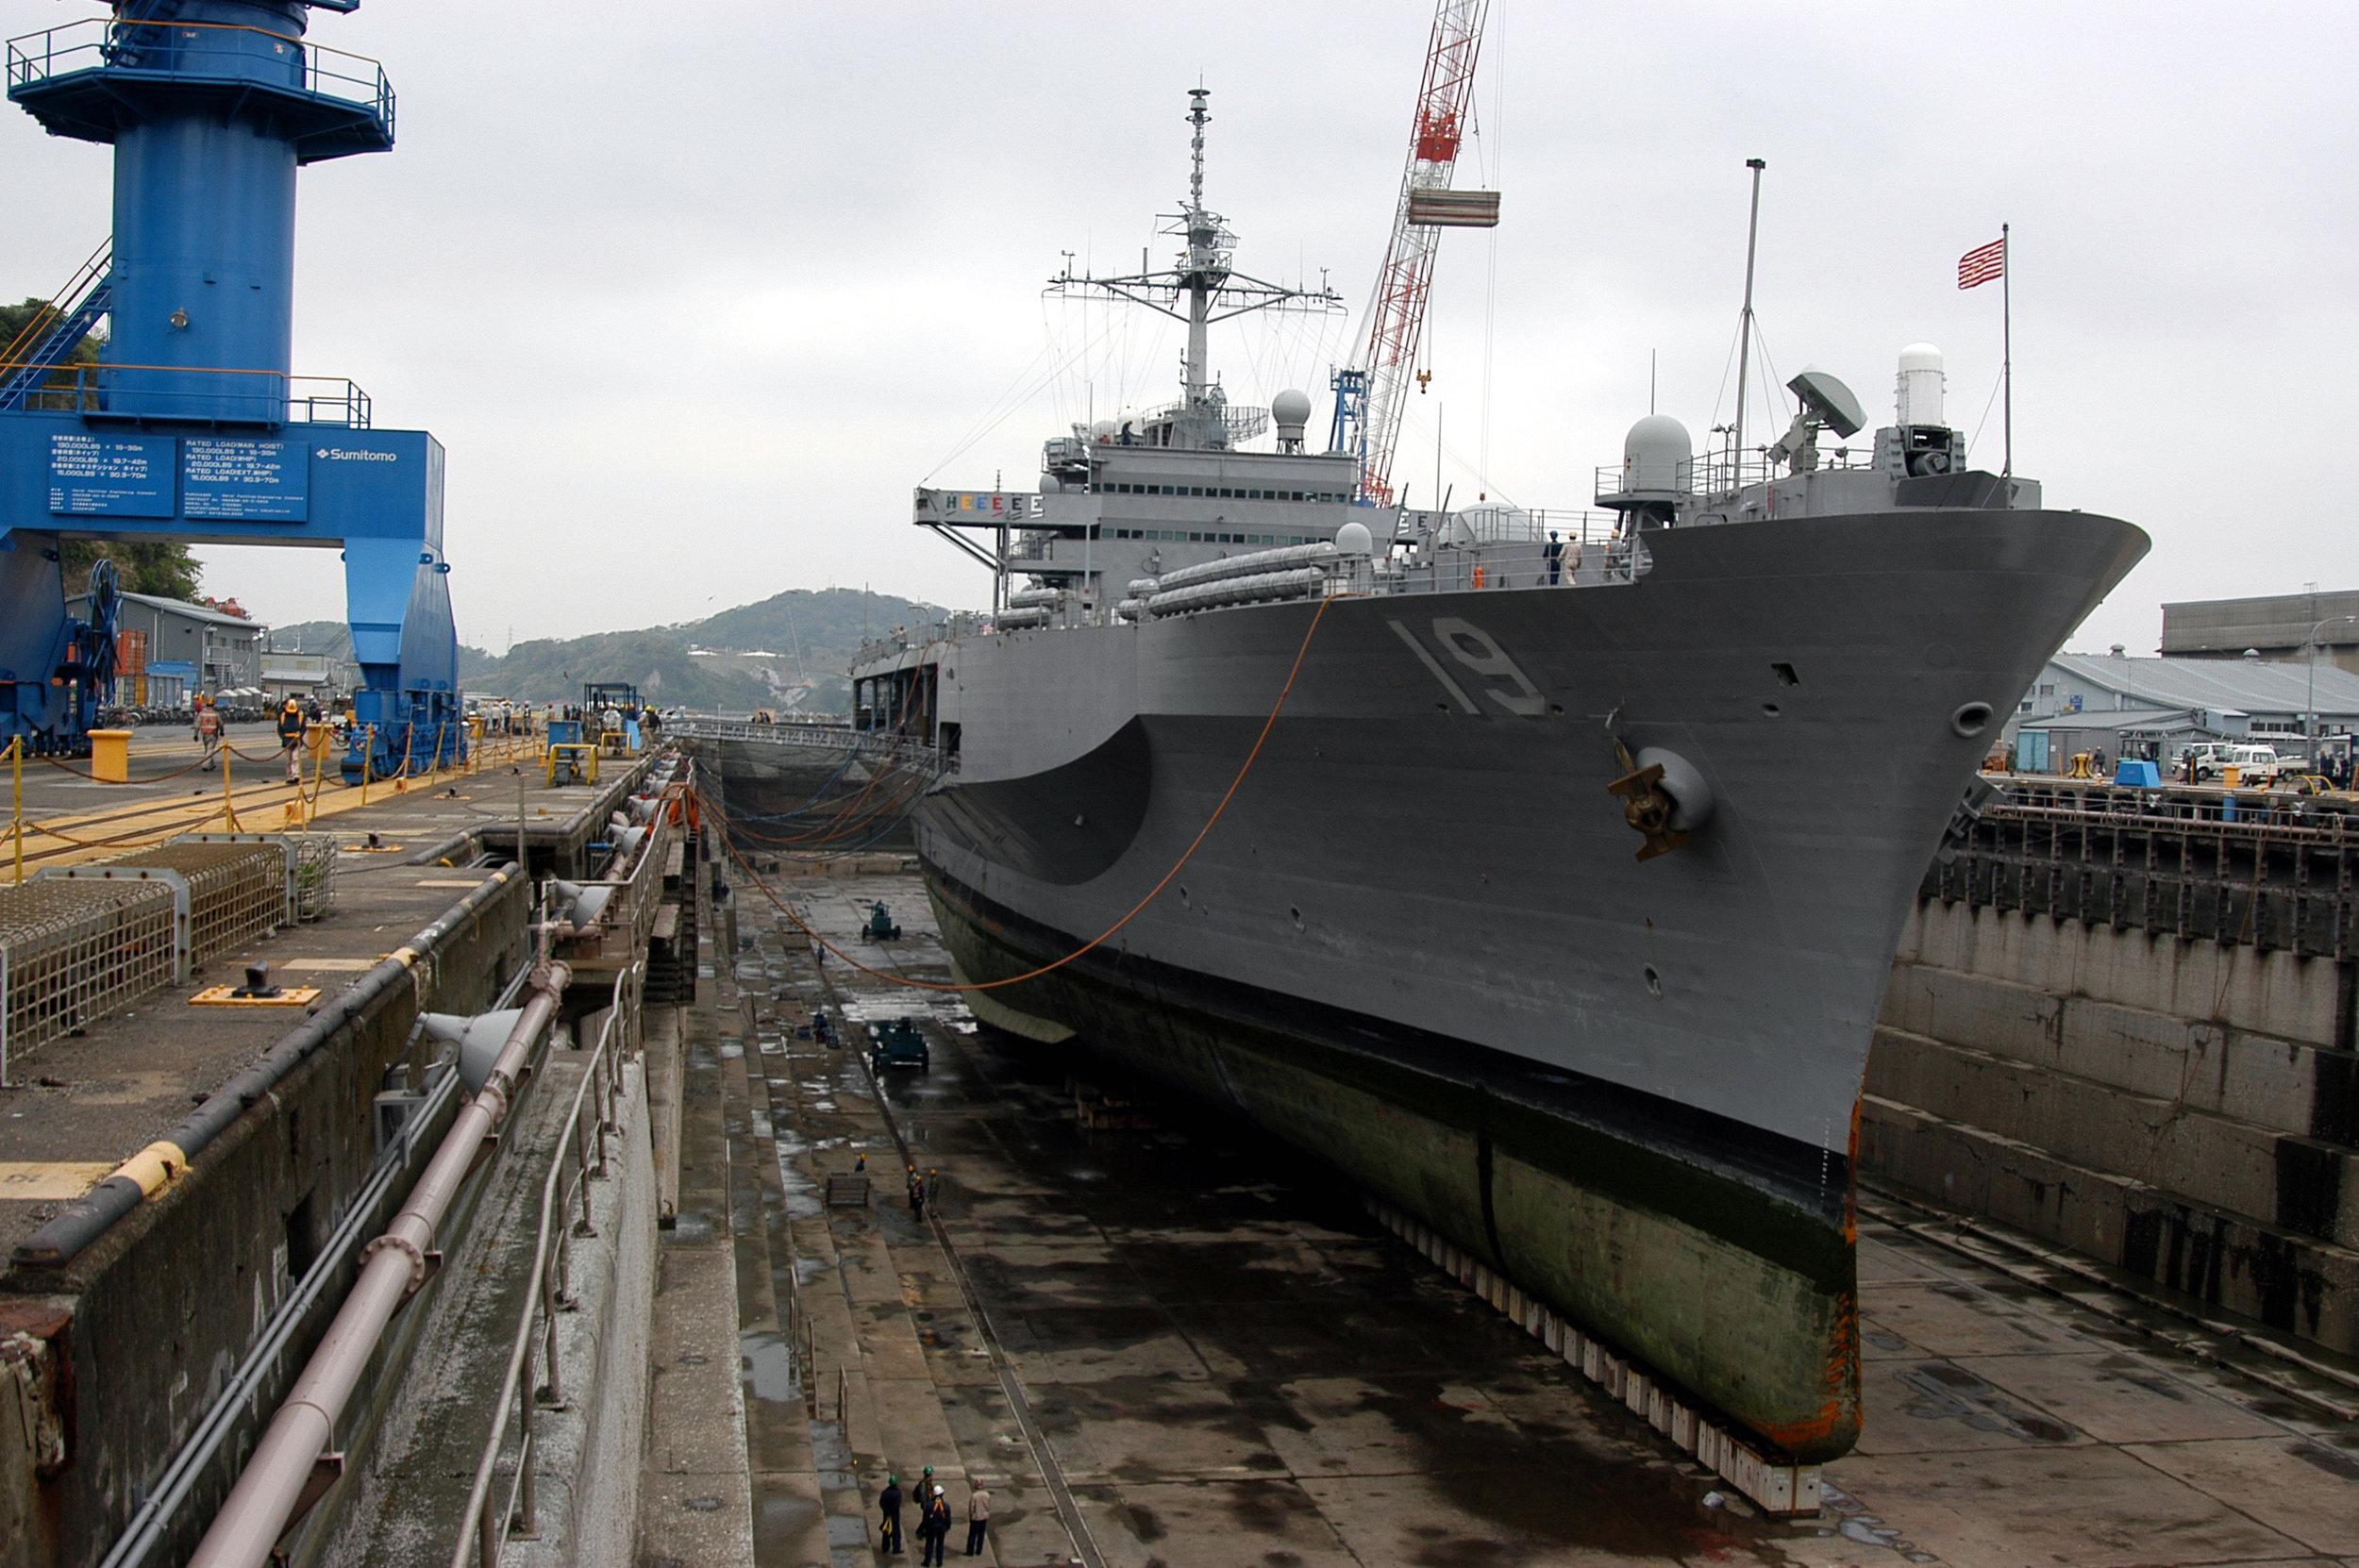 USS Blue Ridge in the Naval Ship Repair Facility dry dock located in Yokosuka, Japan. (Photographer's Mate 3rd Class Lowell Whitman/U.S. Navy Photo)